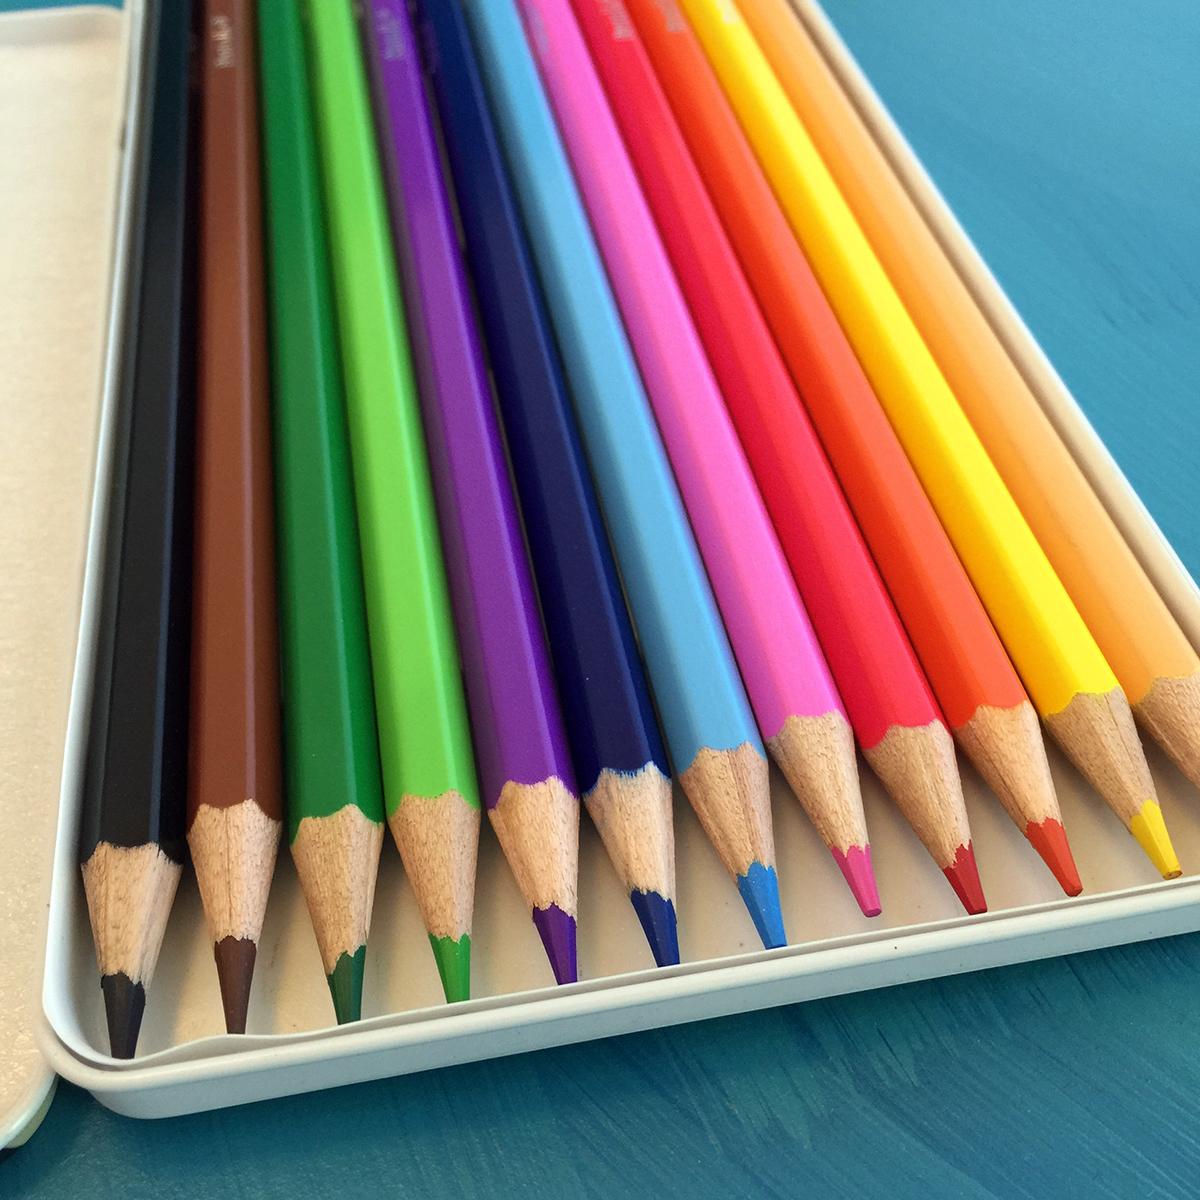 Pentalic Colored Pencil Tin